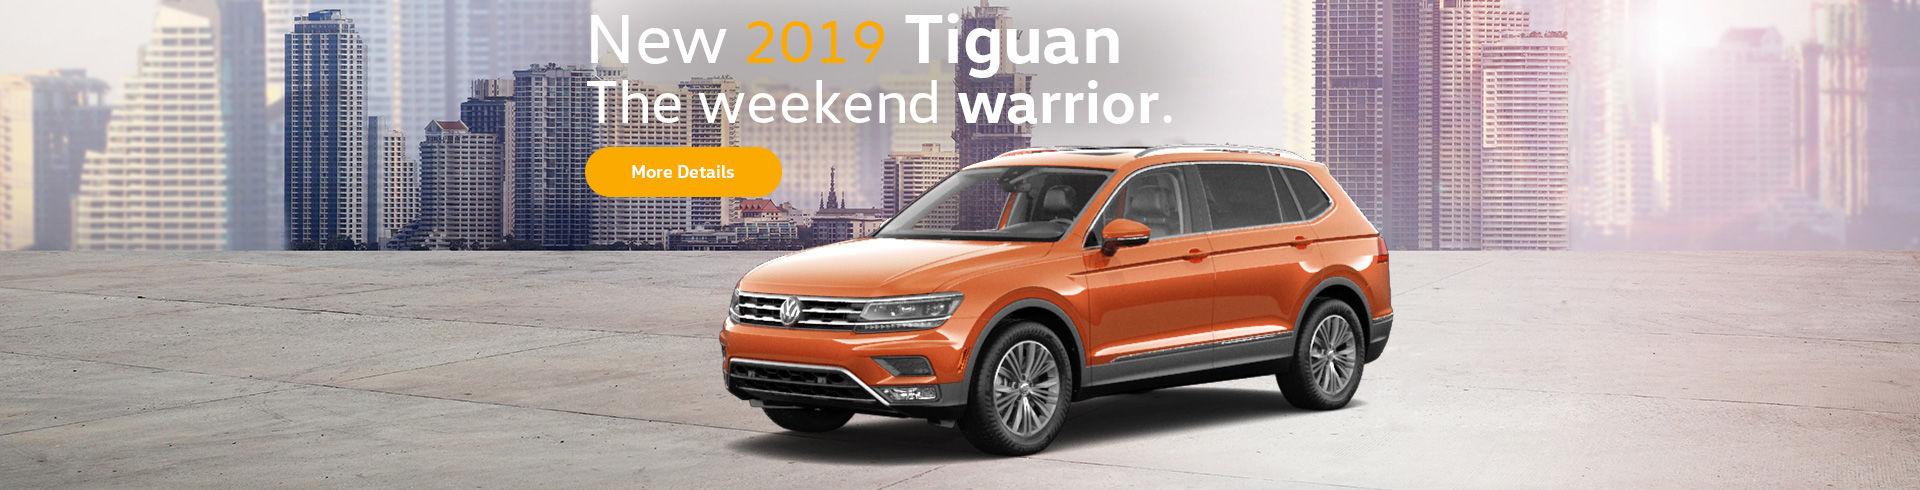 New 2019 Tiguan